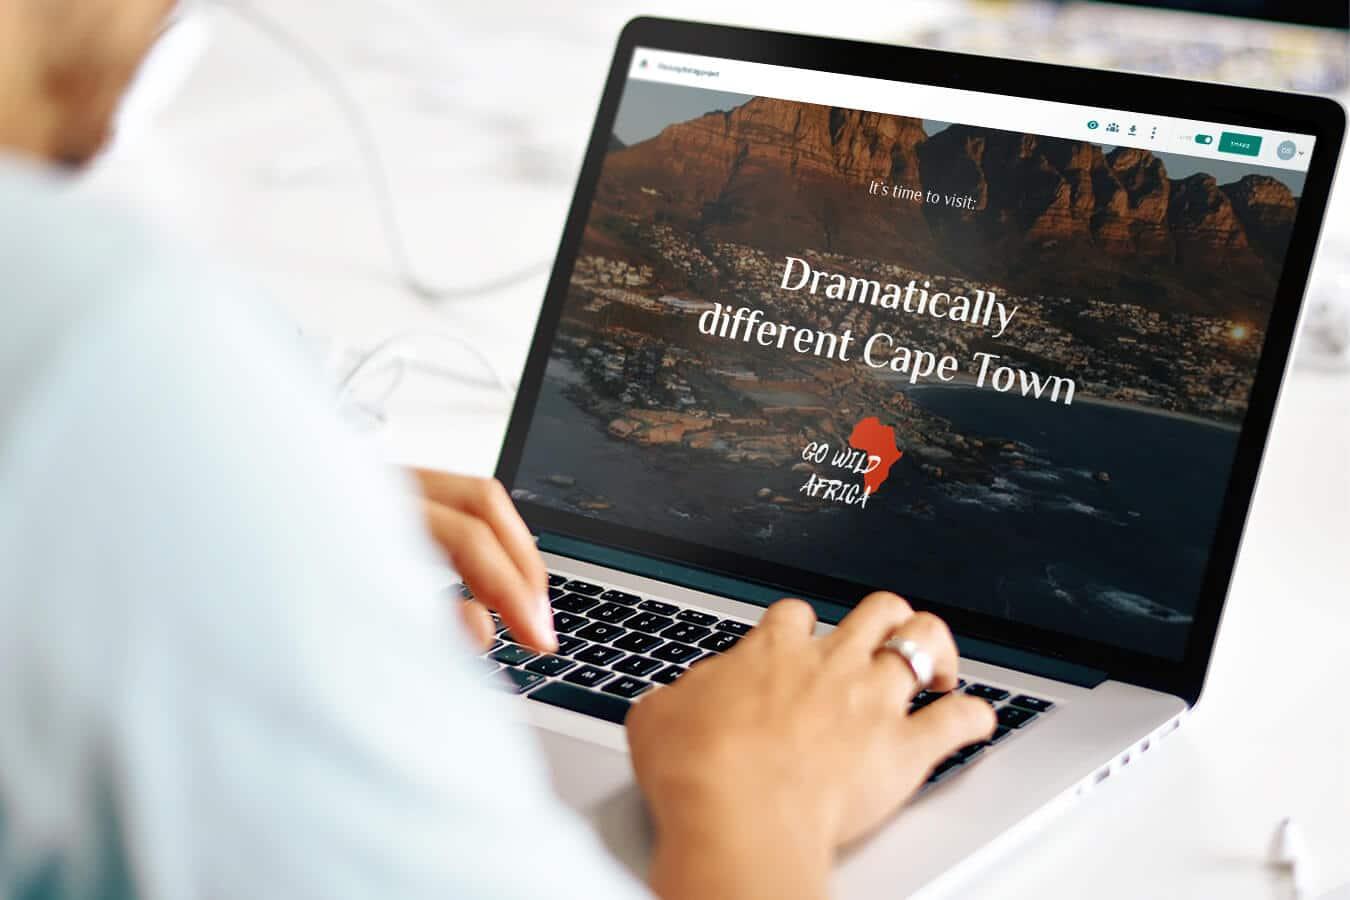 laptop-travel-brochure-a